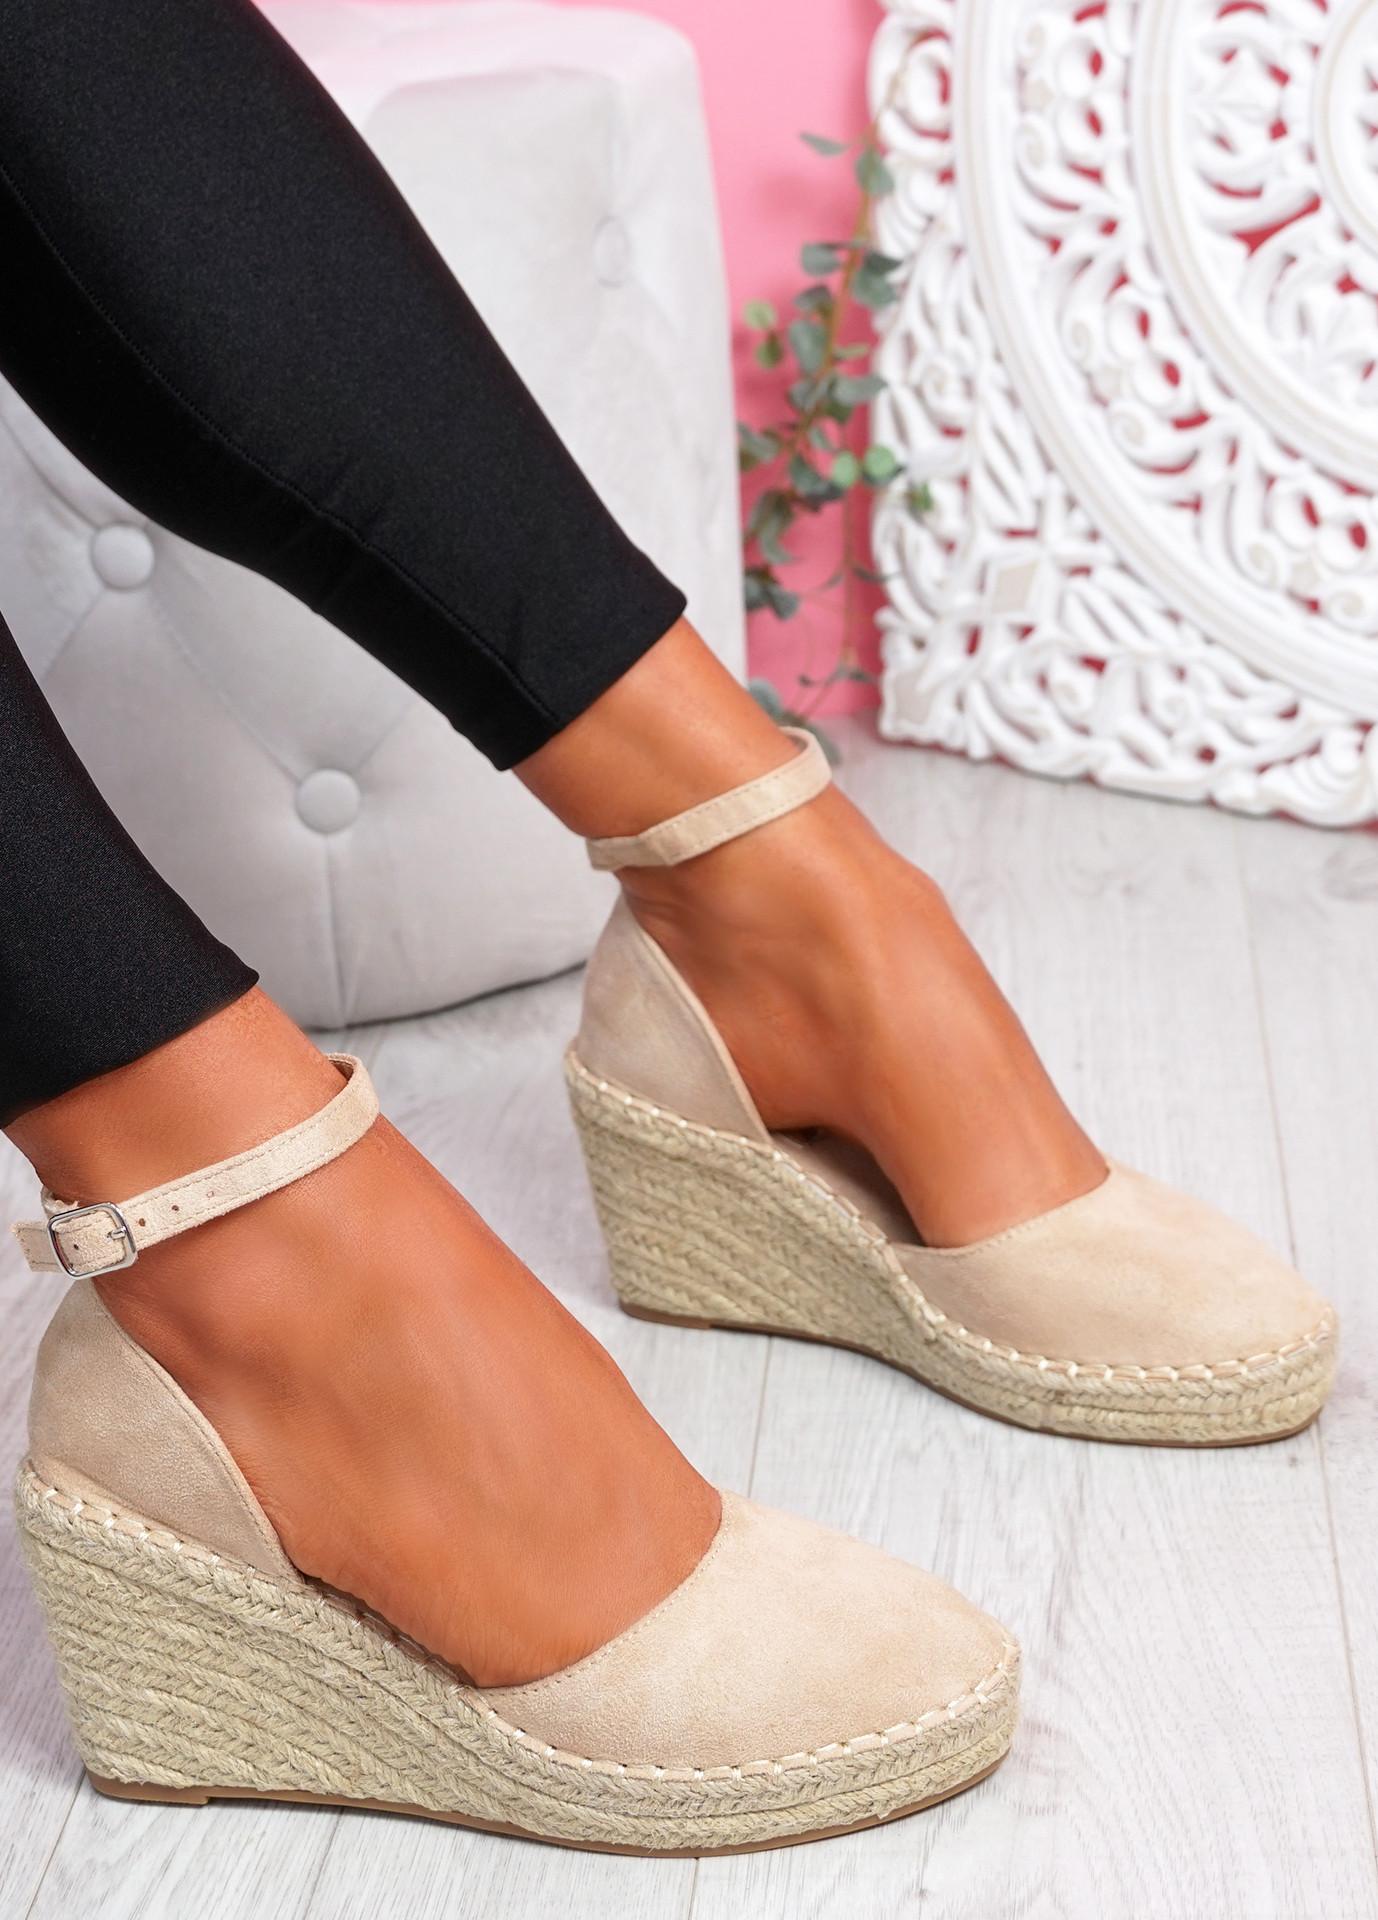 Tifa Beige Wedges Platform Sandals